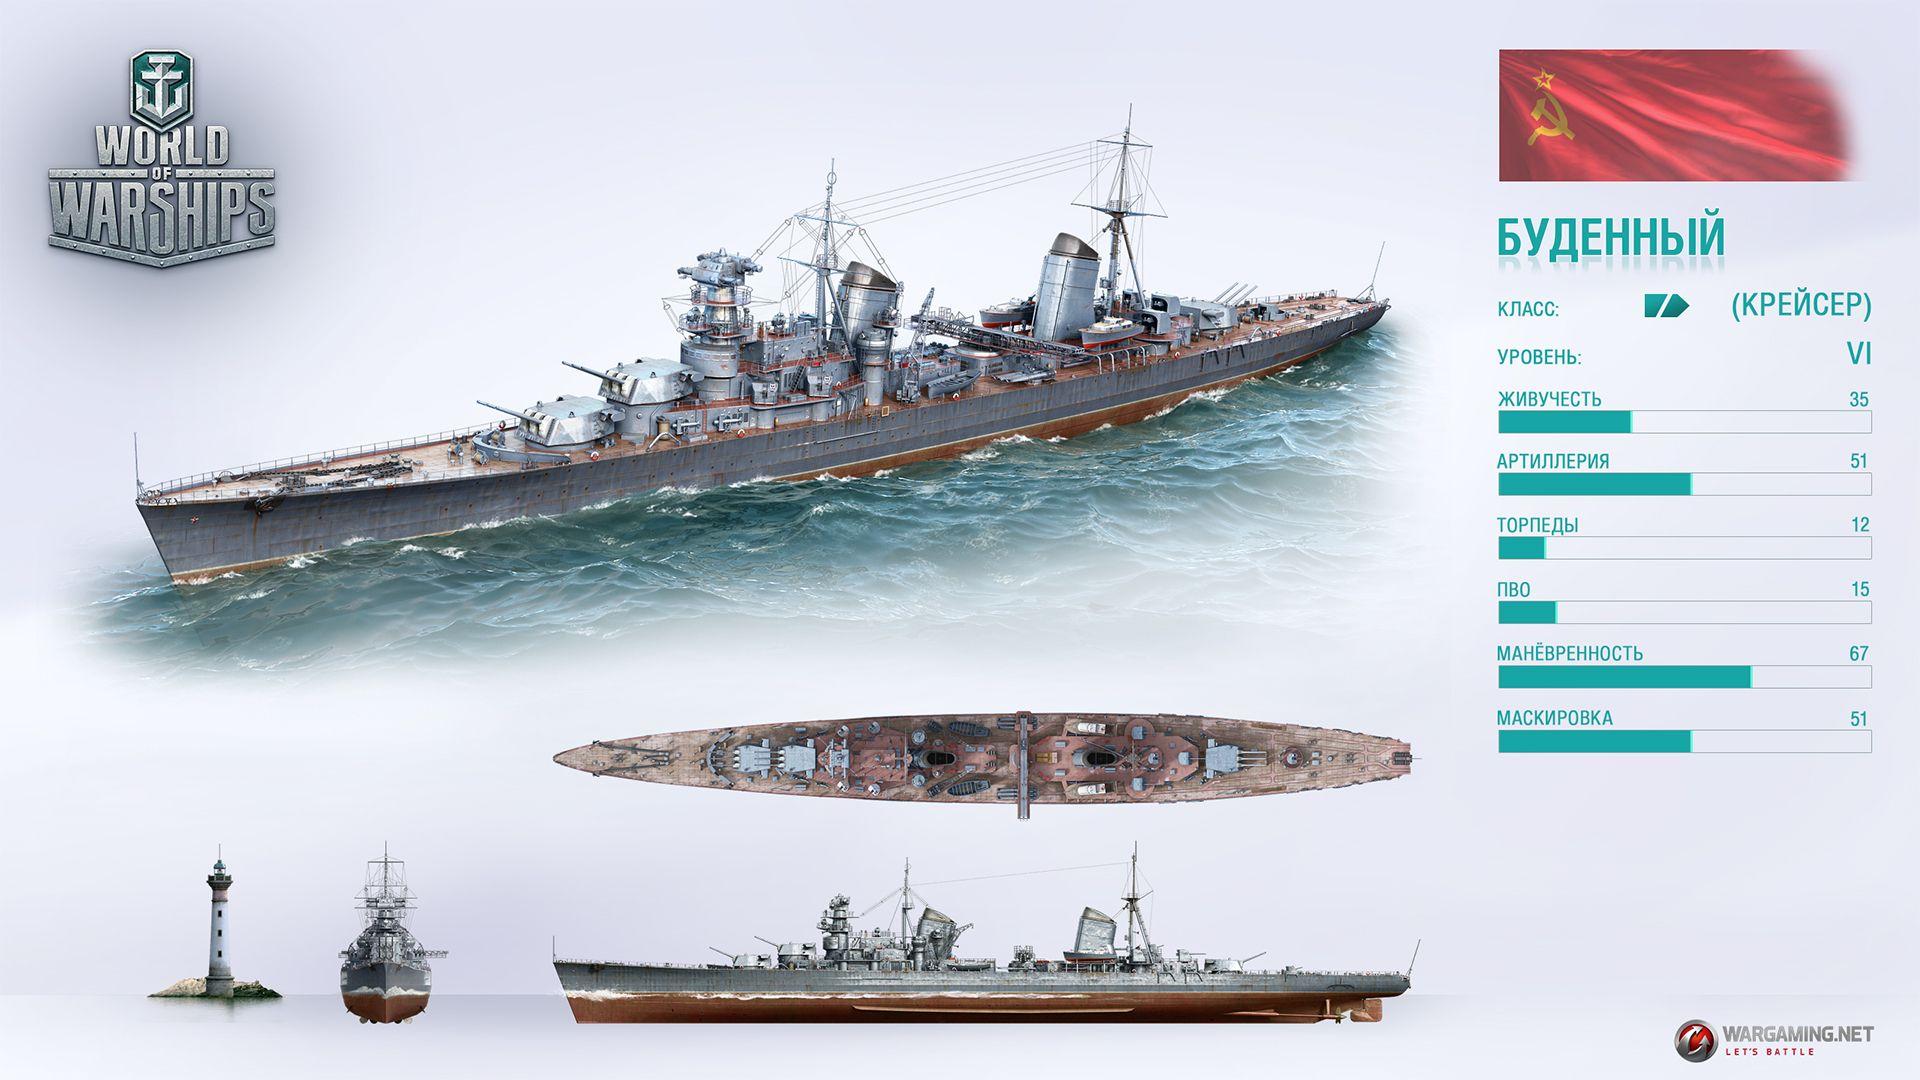 hight resolution of budyonny class cruisers russia naval history pinterest nelson class battleship battleship in ww2 russian diagram